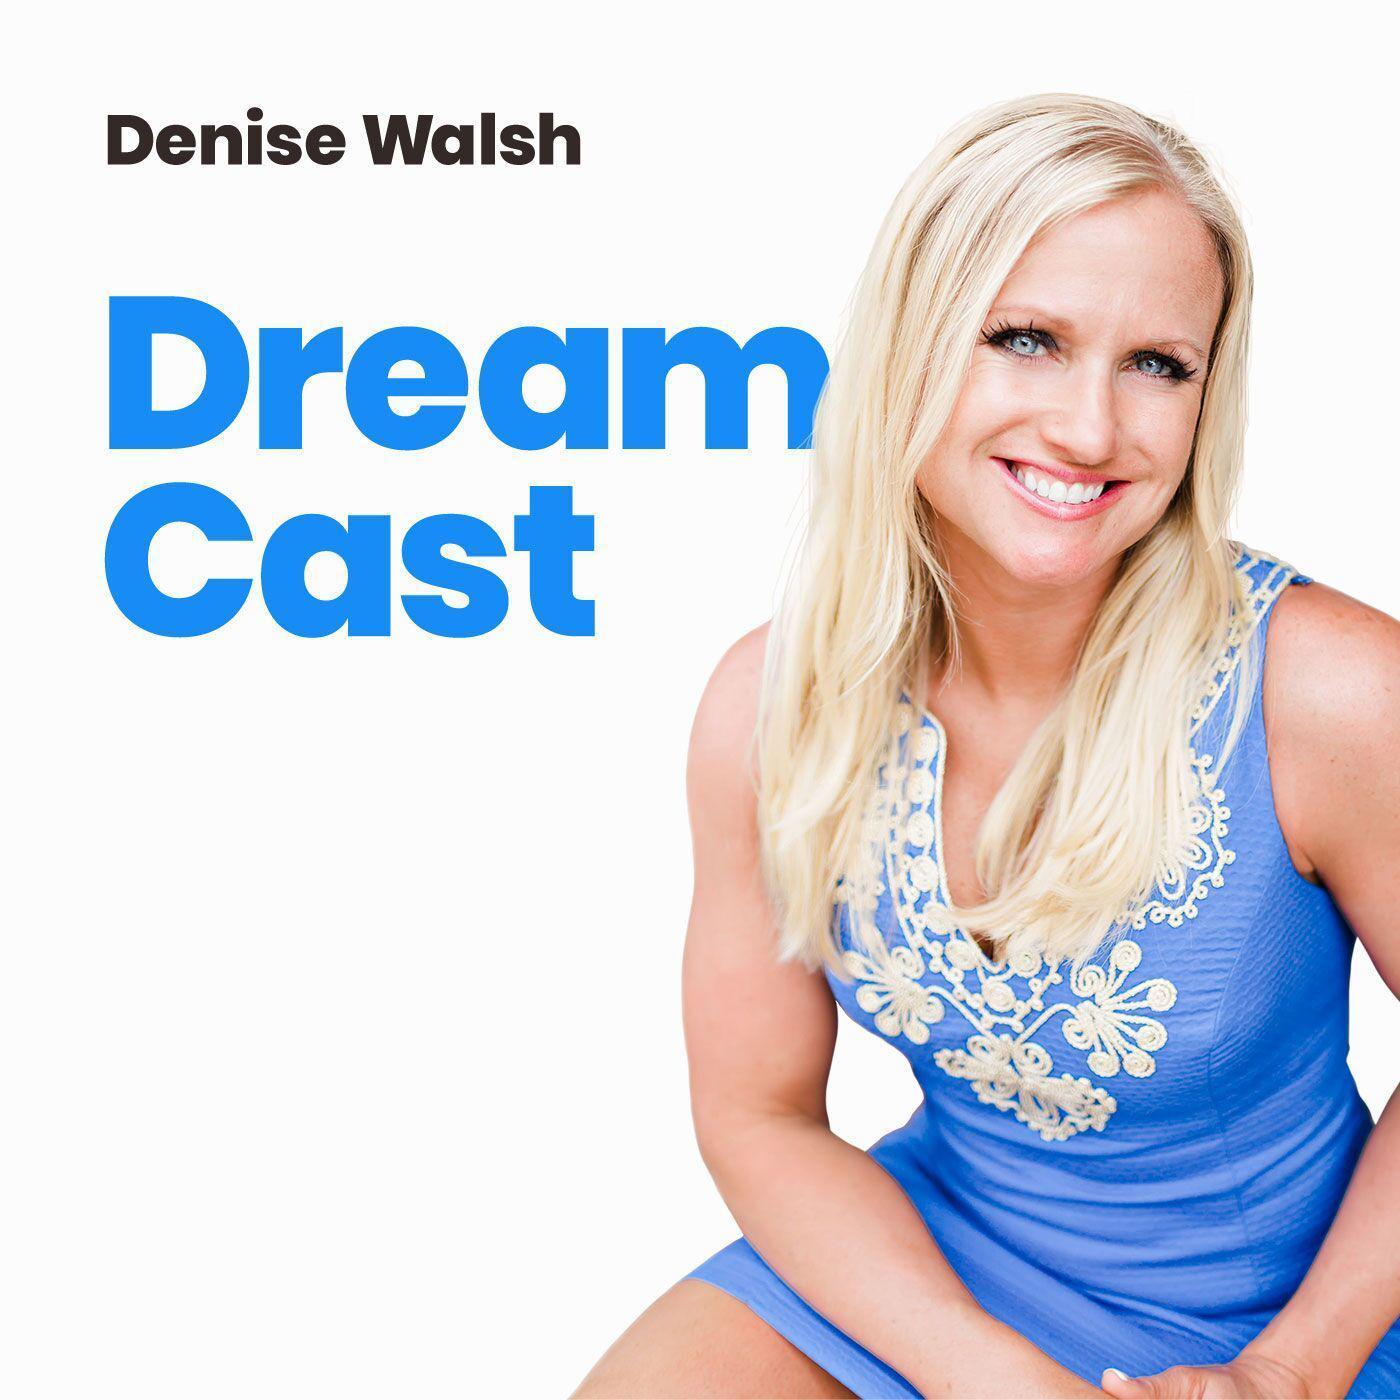 Dream Cast - Denise Walsh